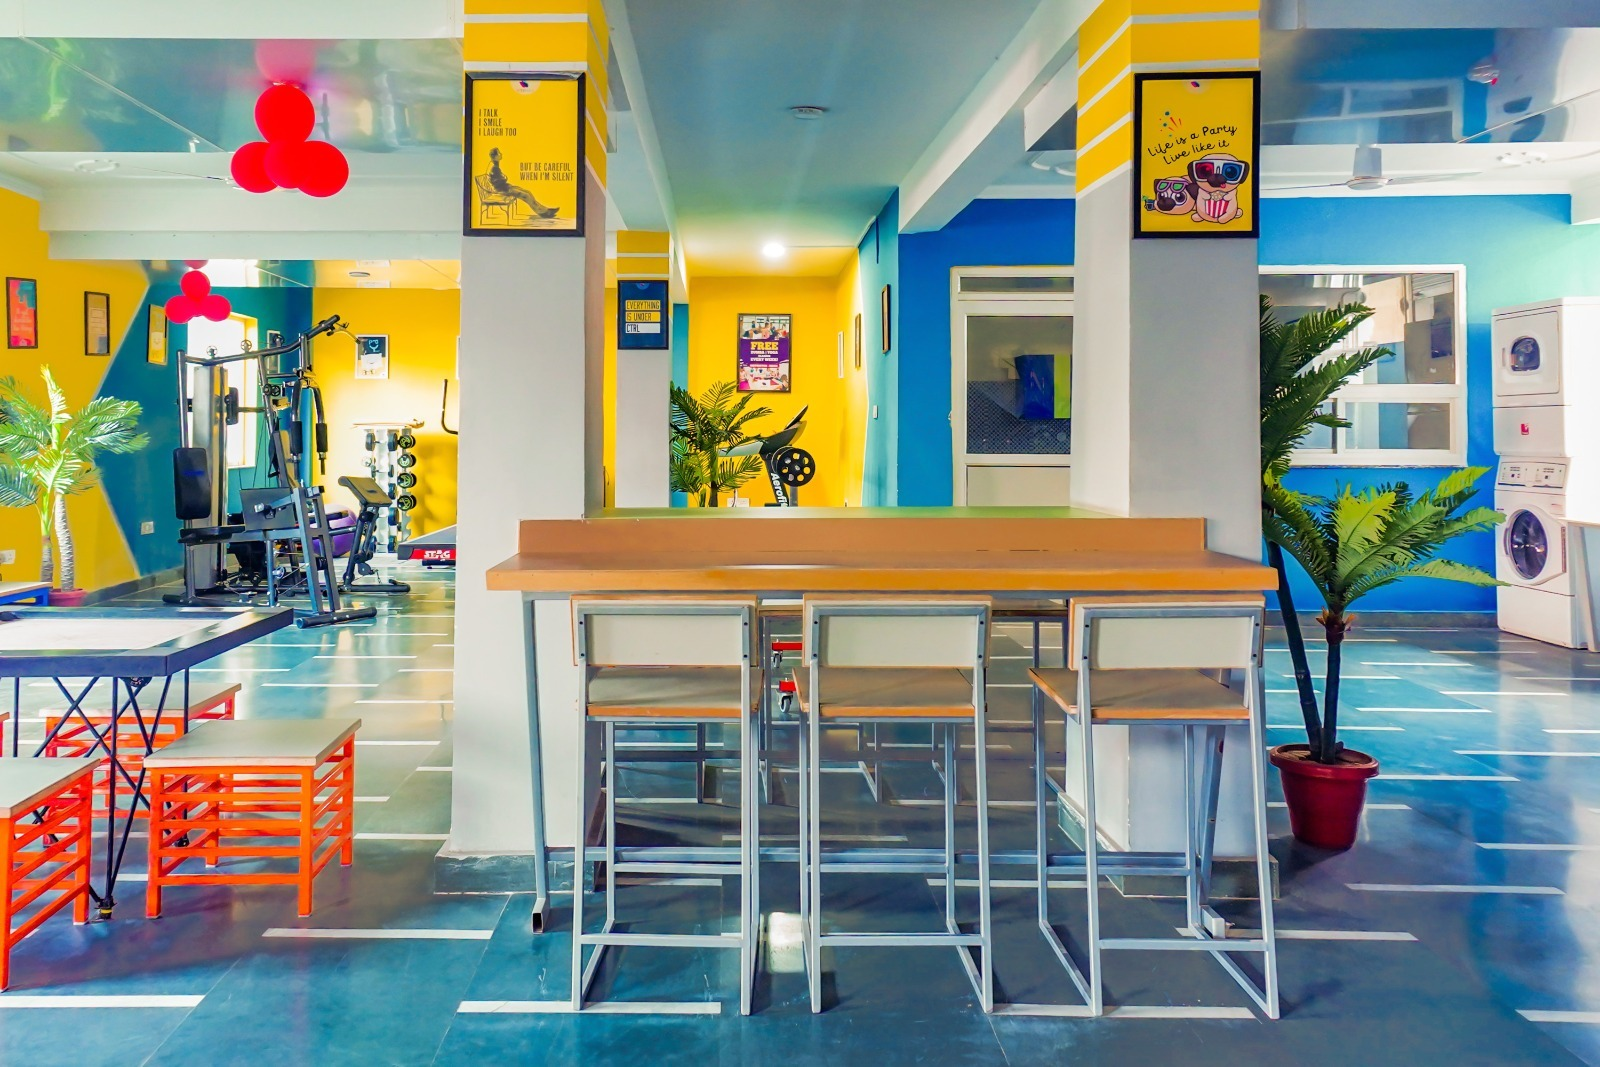 Amyra Residency by Isthara - Sec 48, Gurgaon